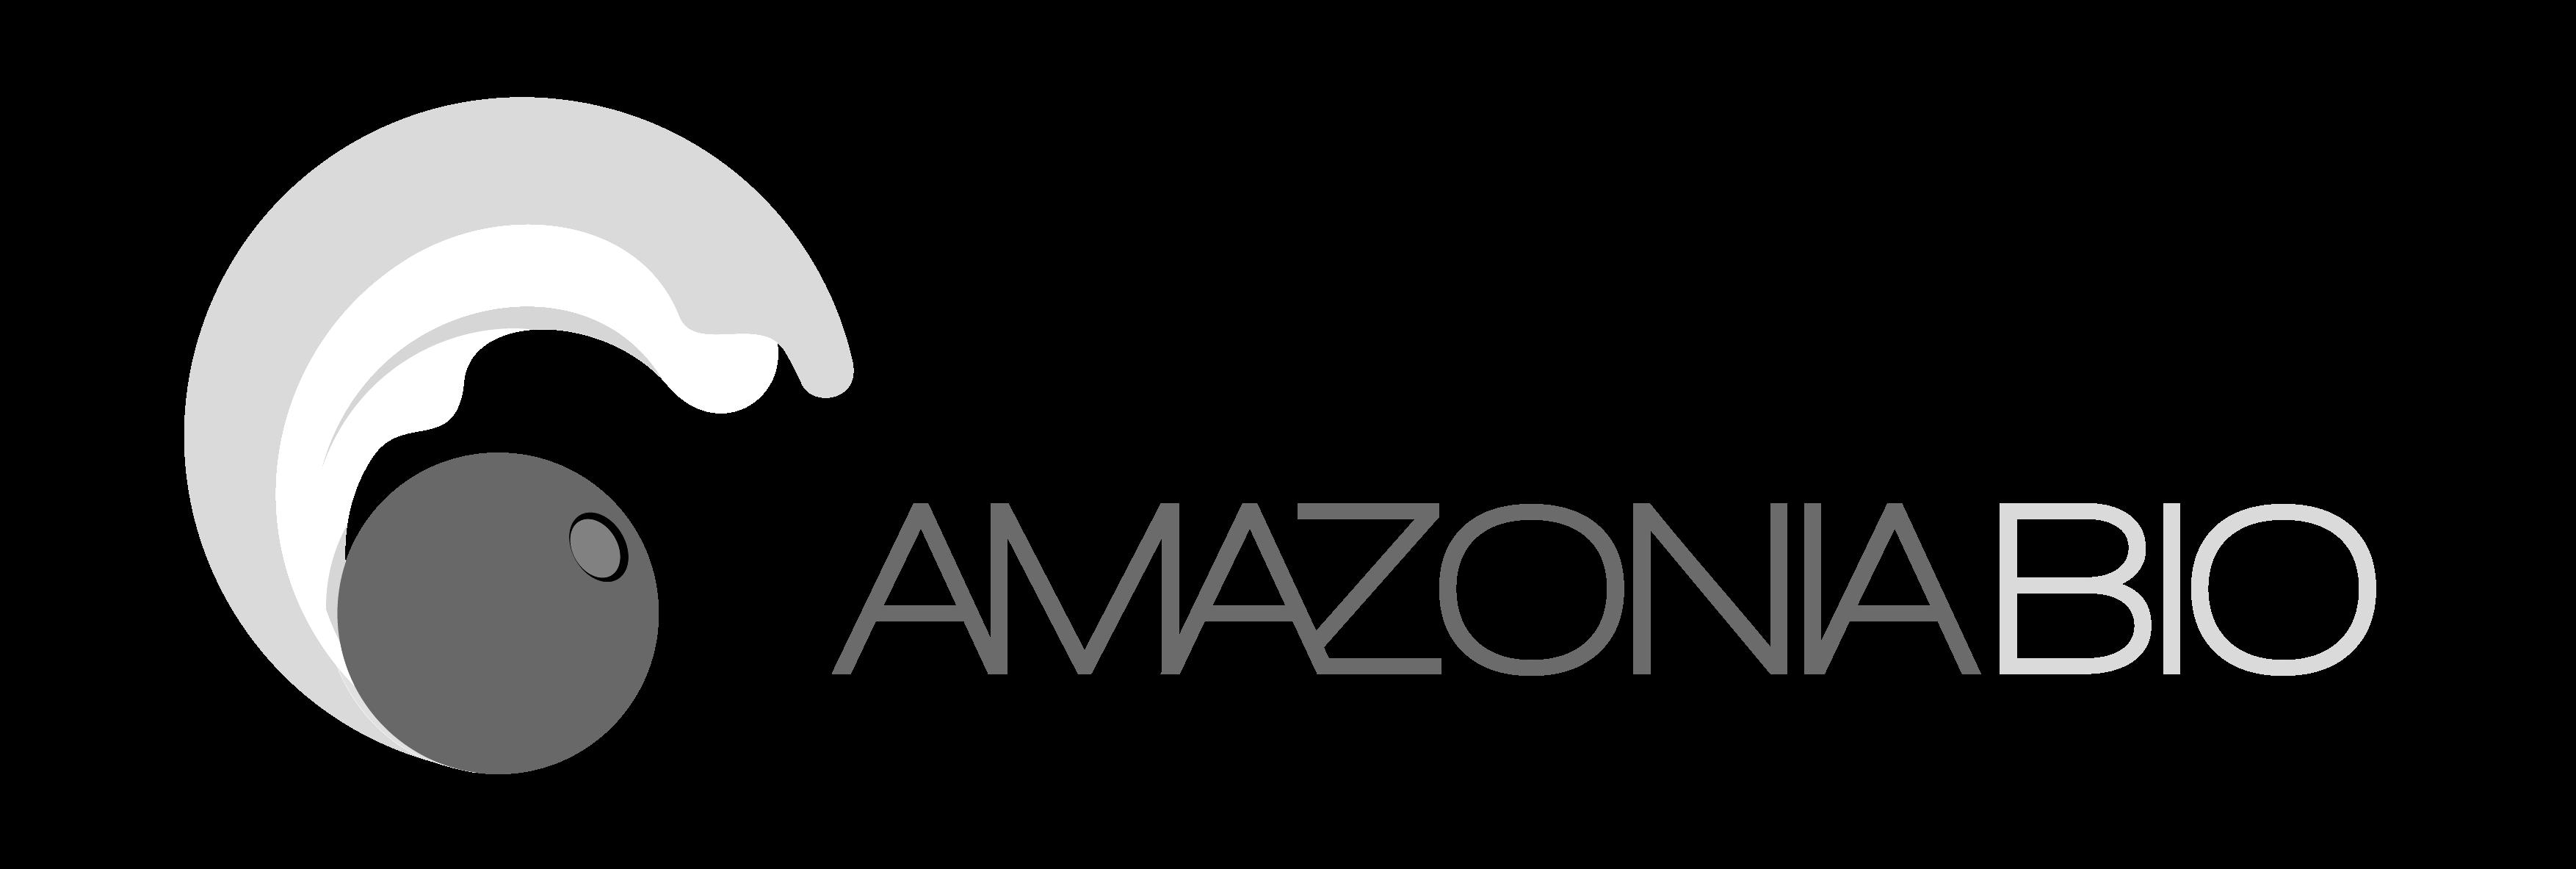 Amazonia Bio